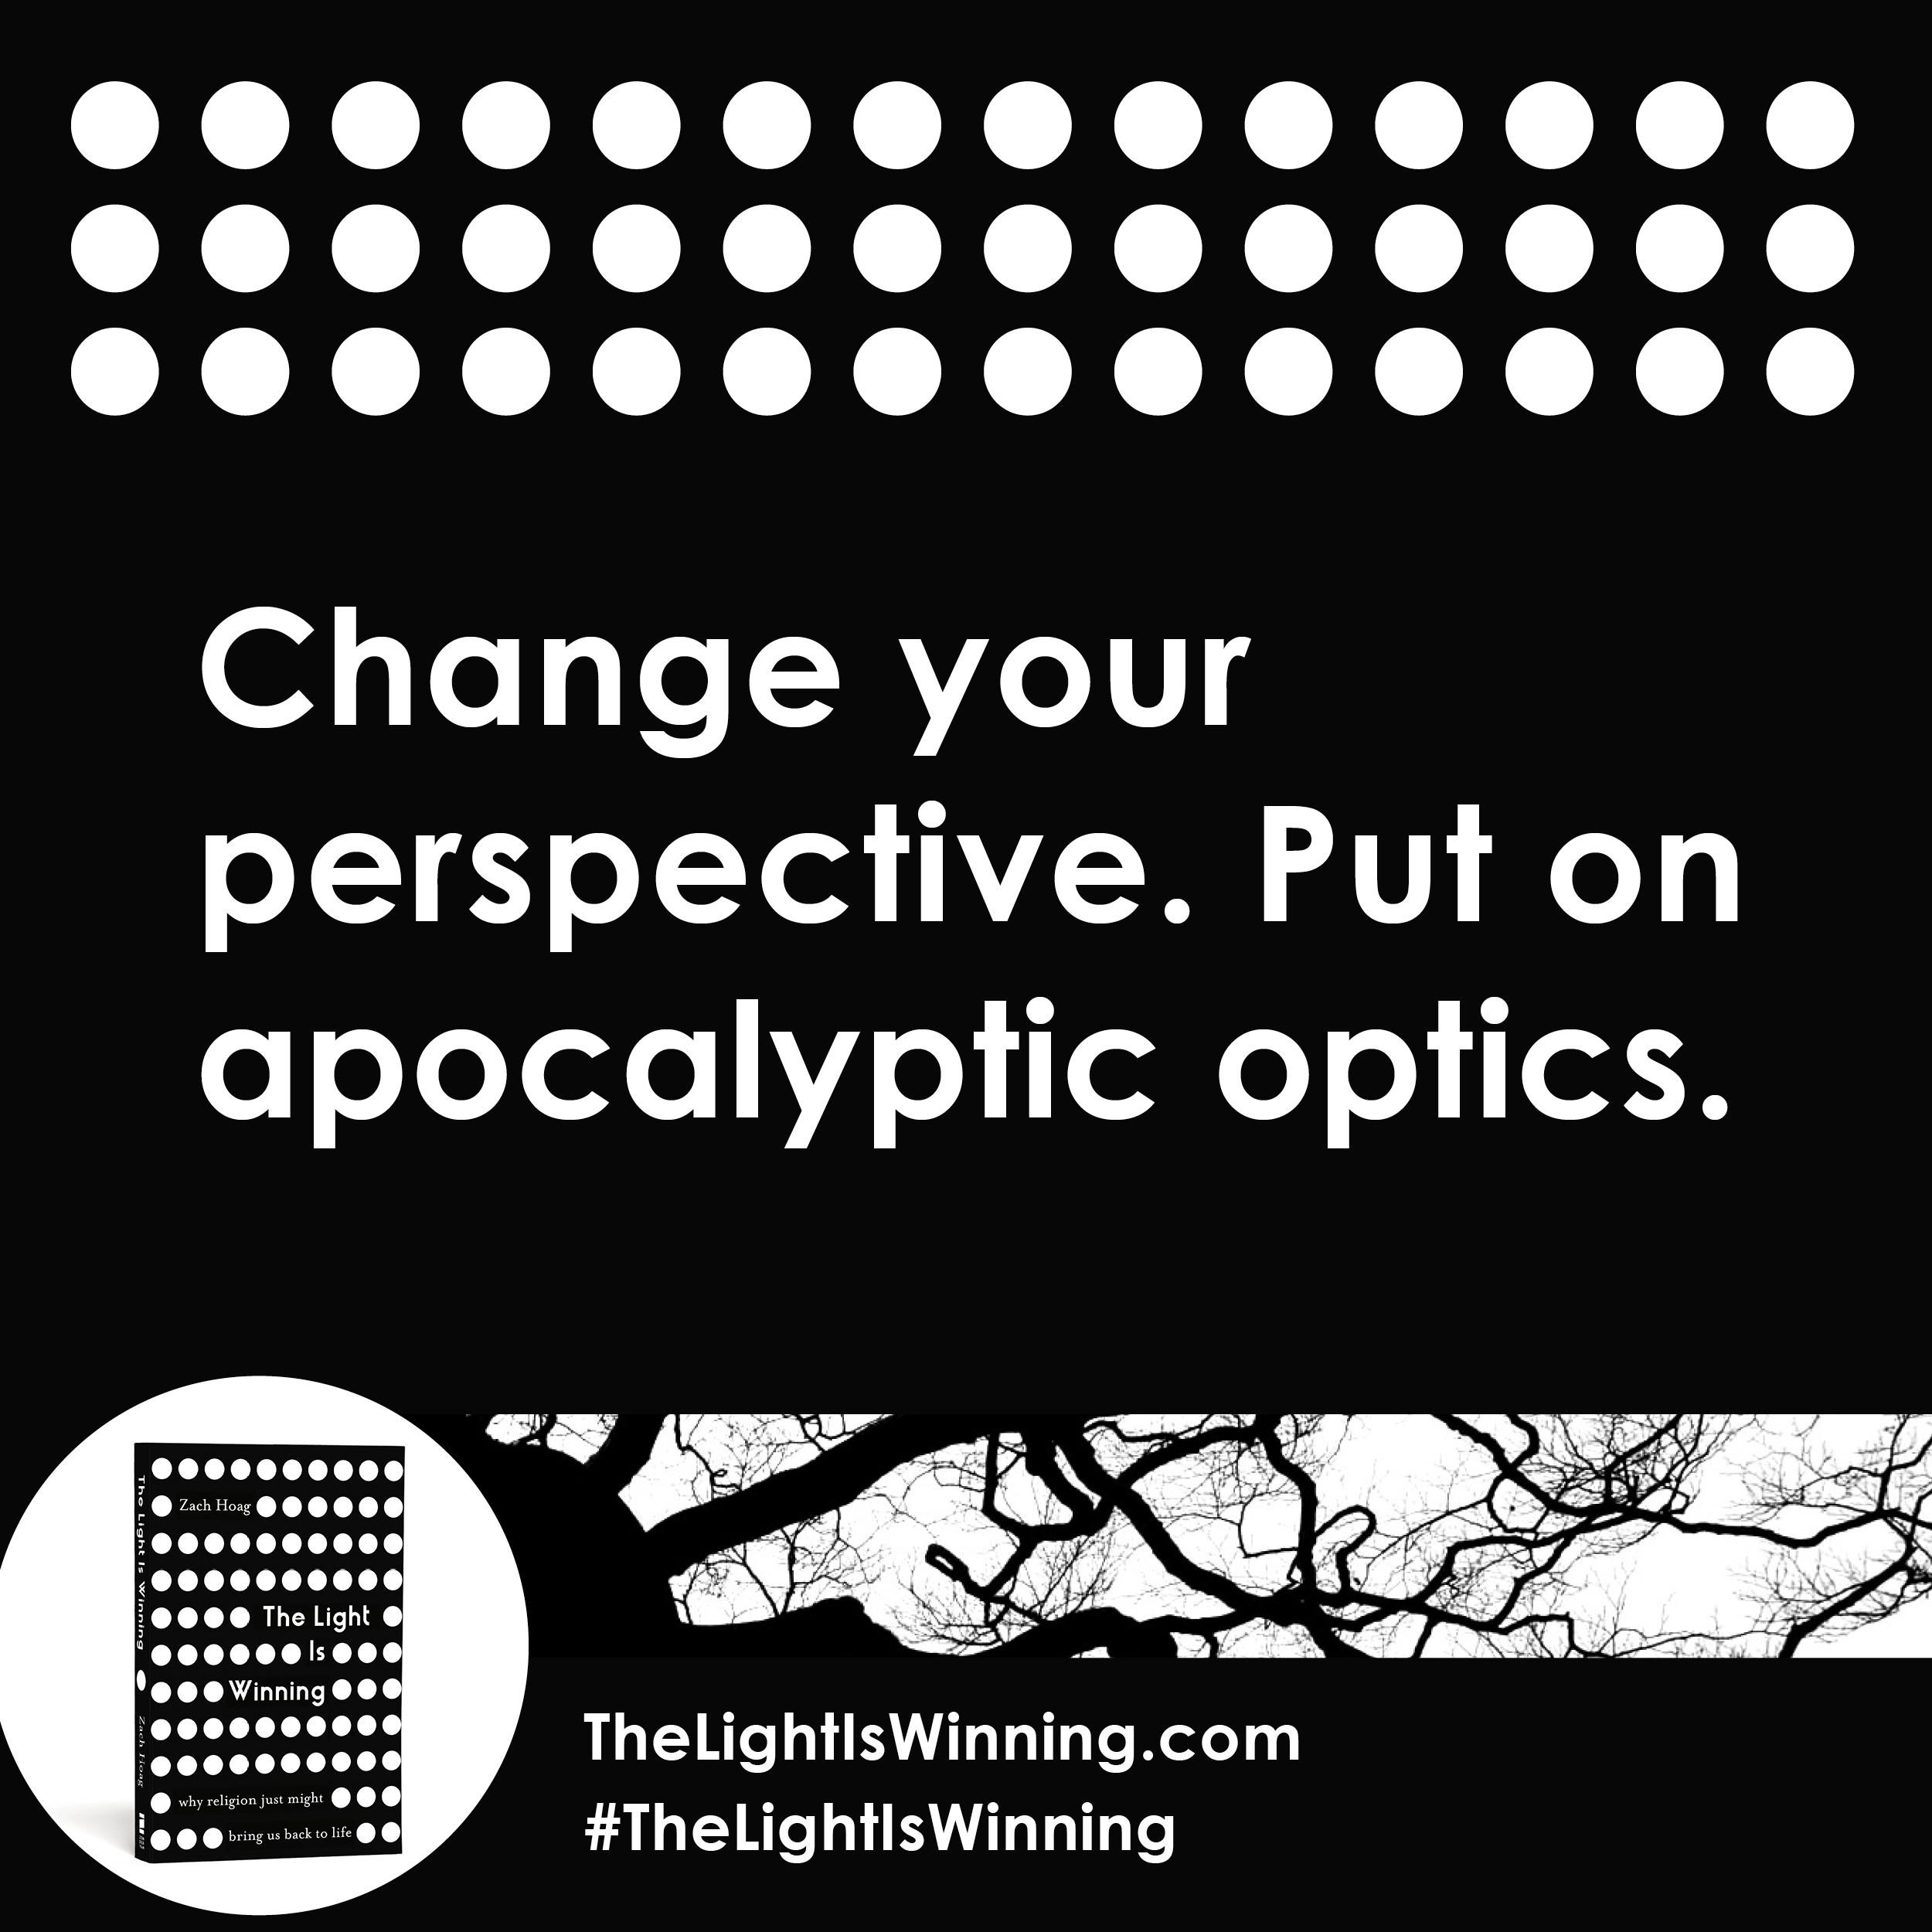 ApocalypticOptics.jpg